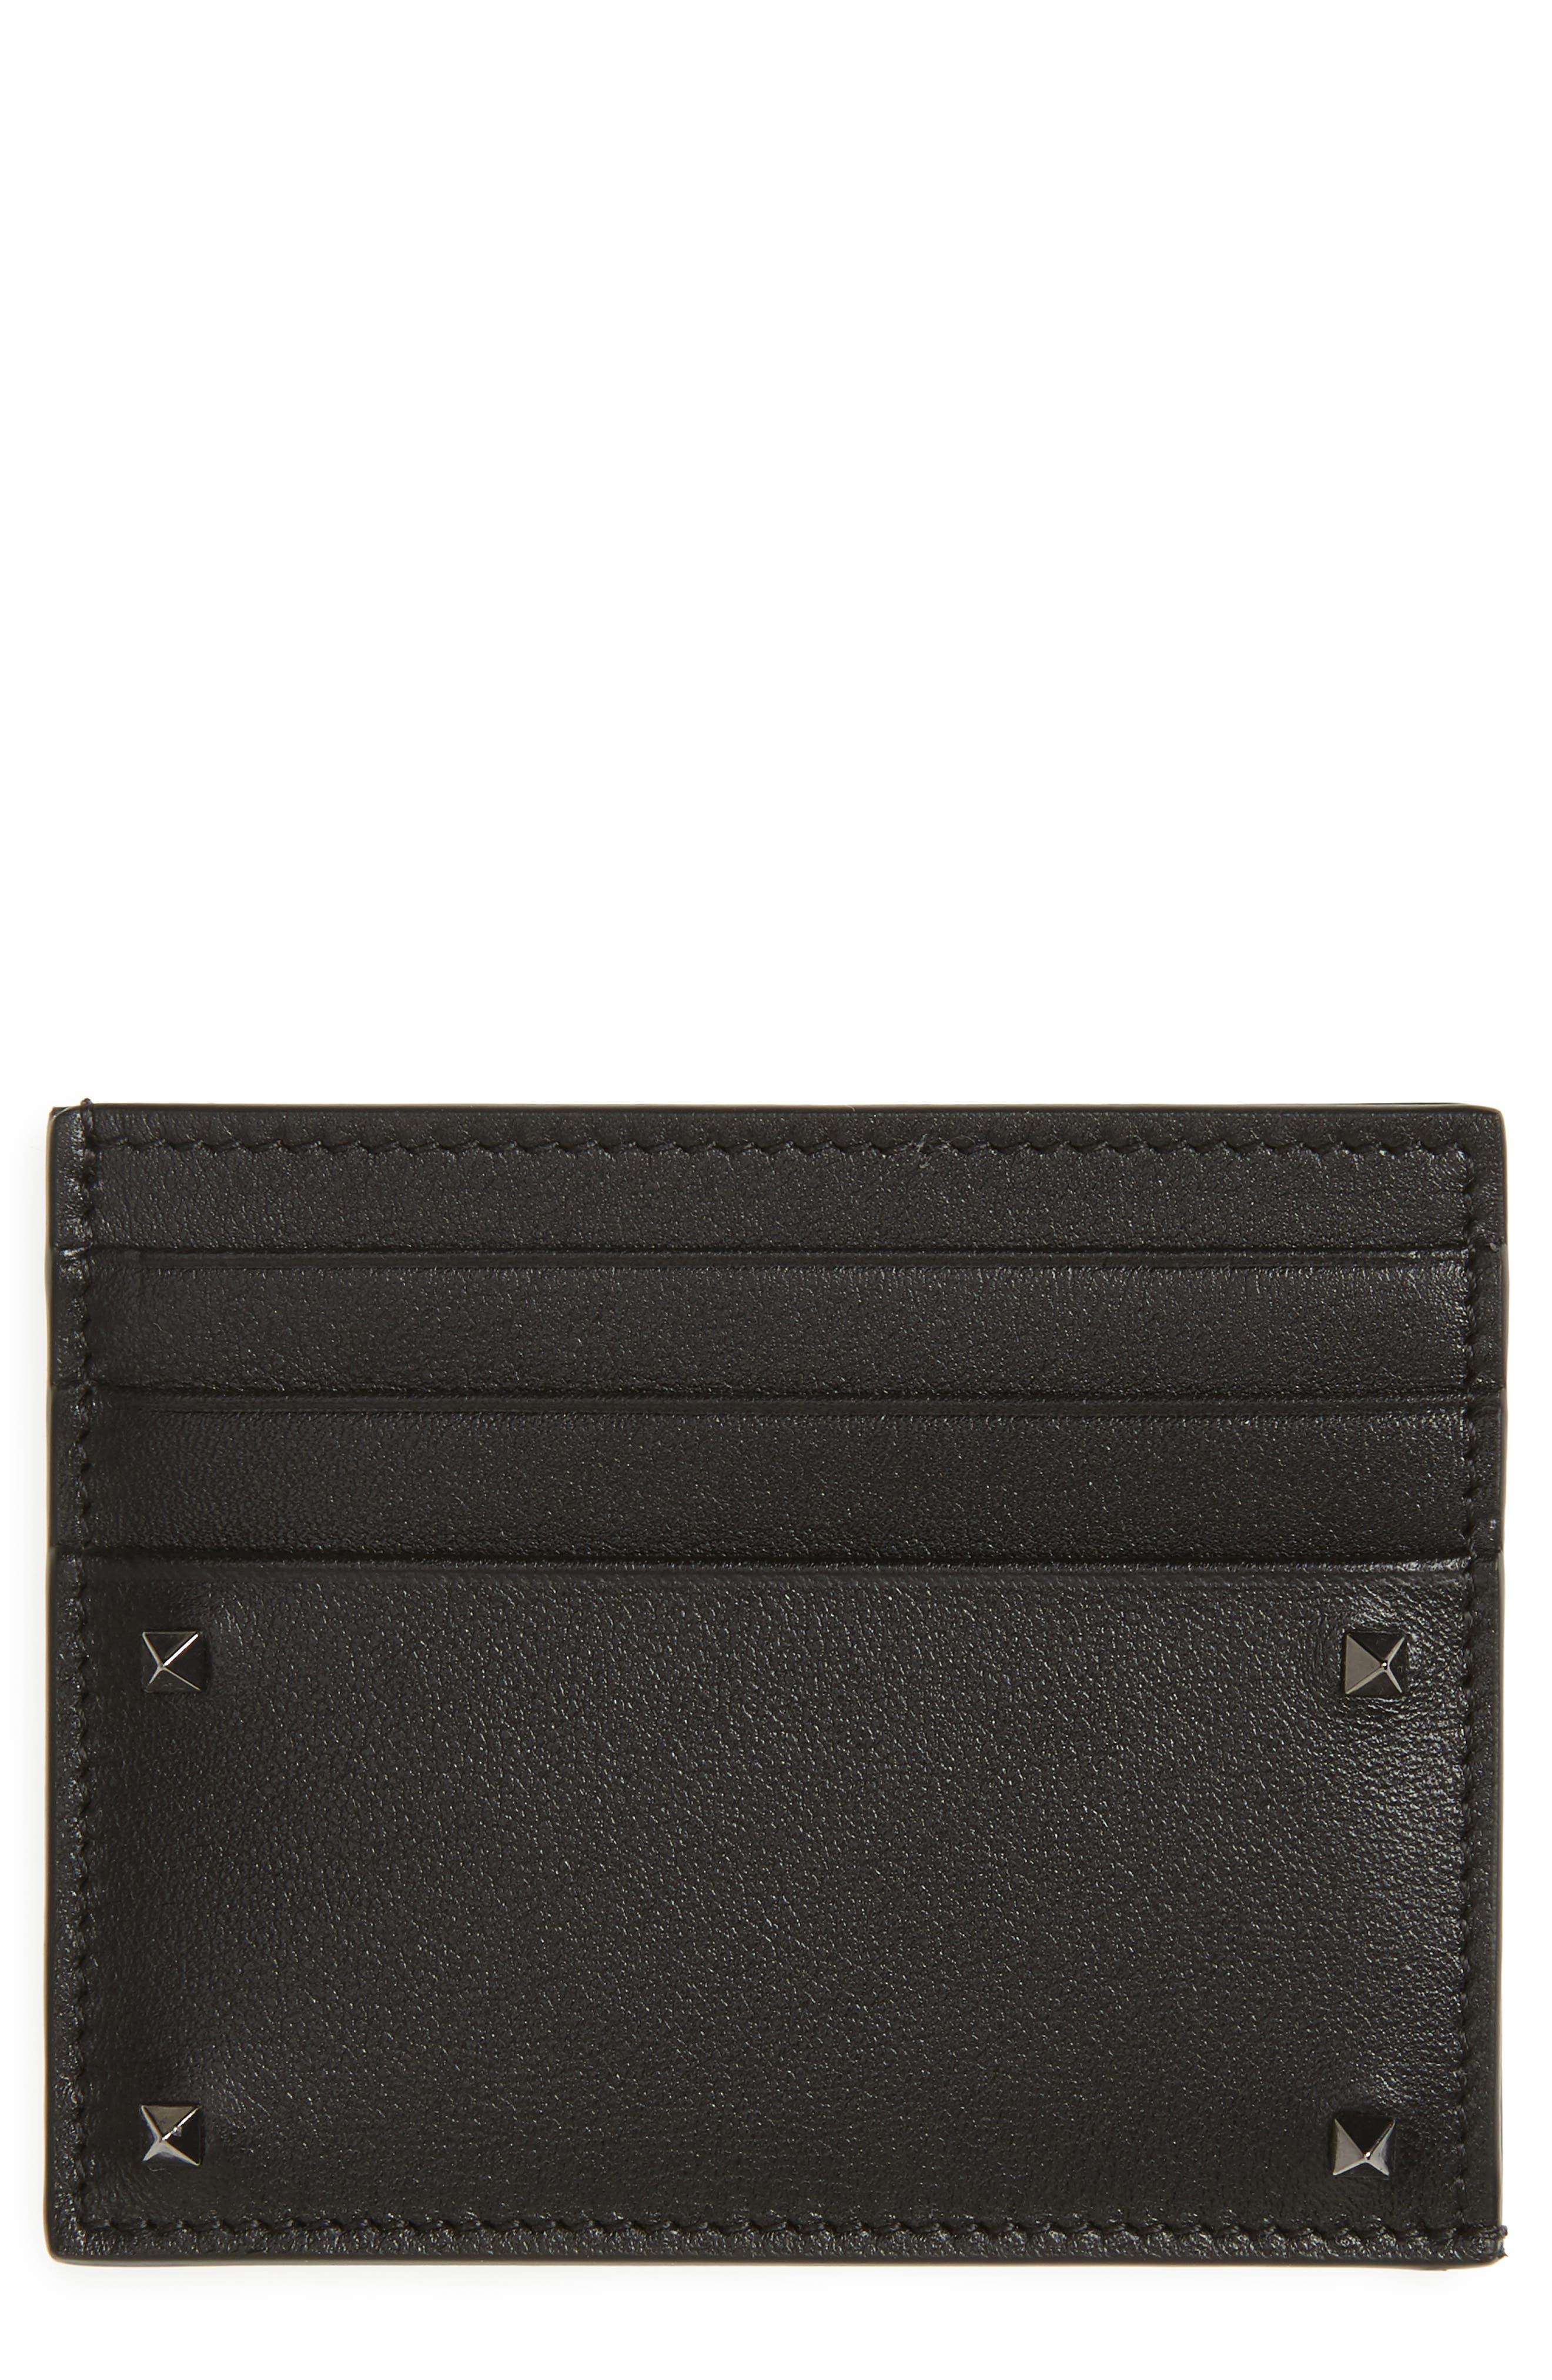 GARAVANI Mini Rock Stud Leather Card Case,                             Main thumbnail 1, color,                             001